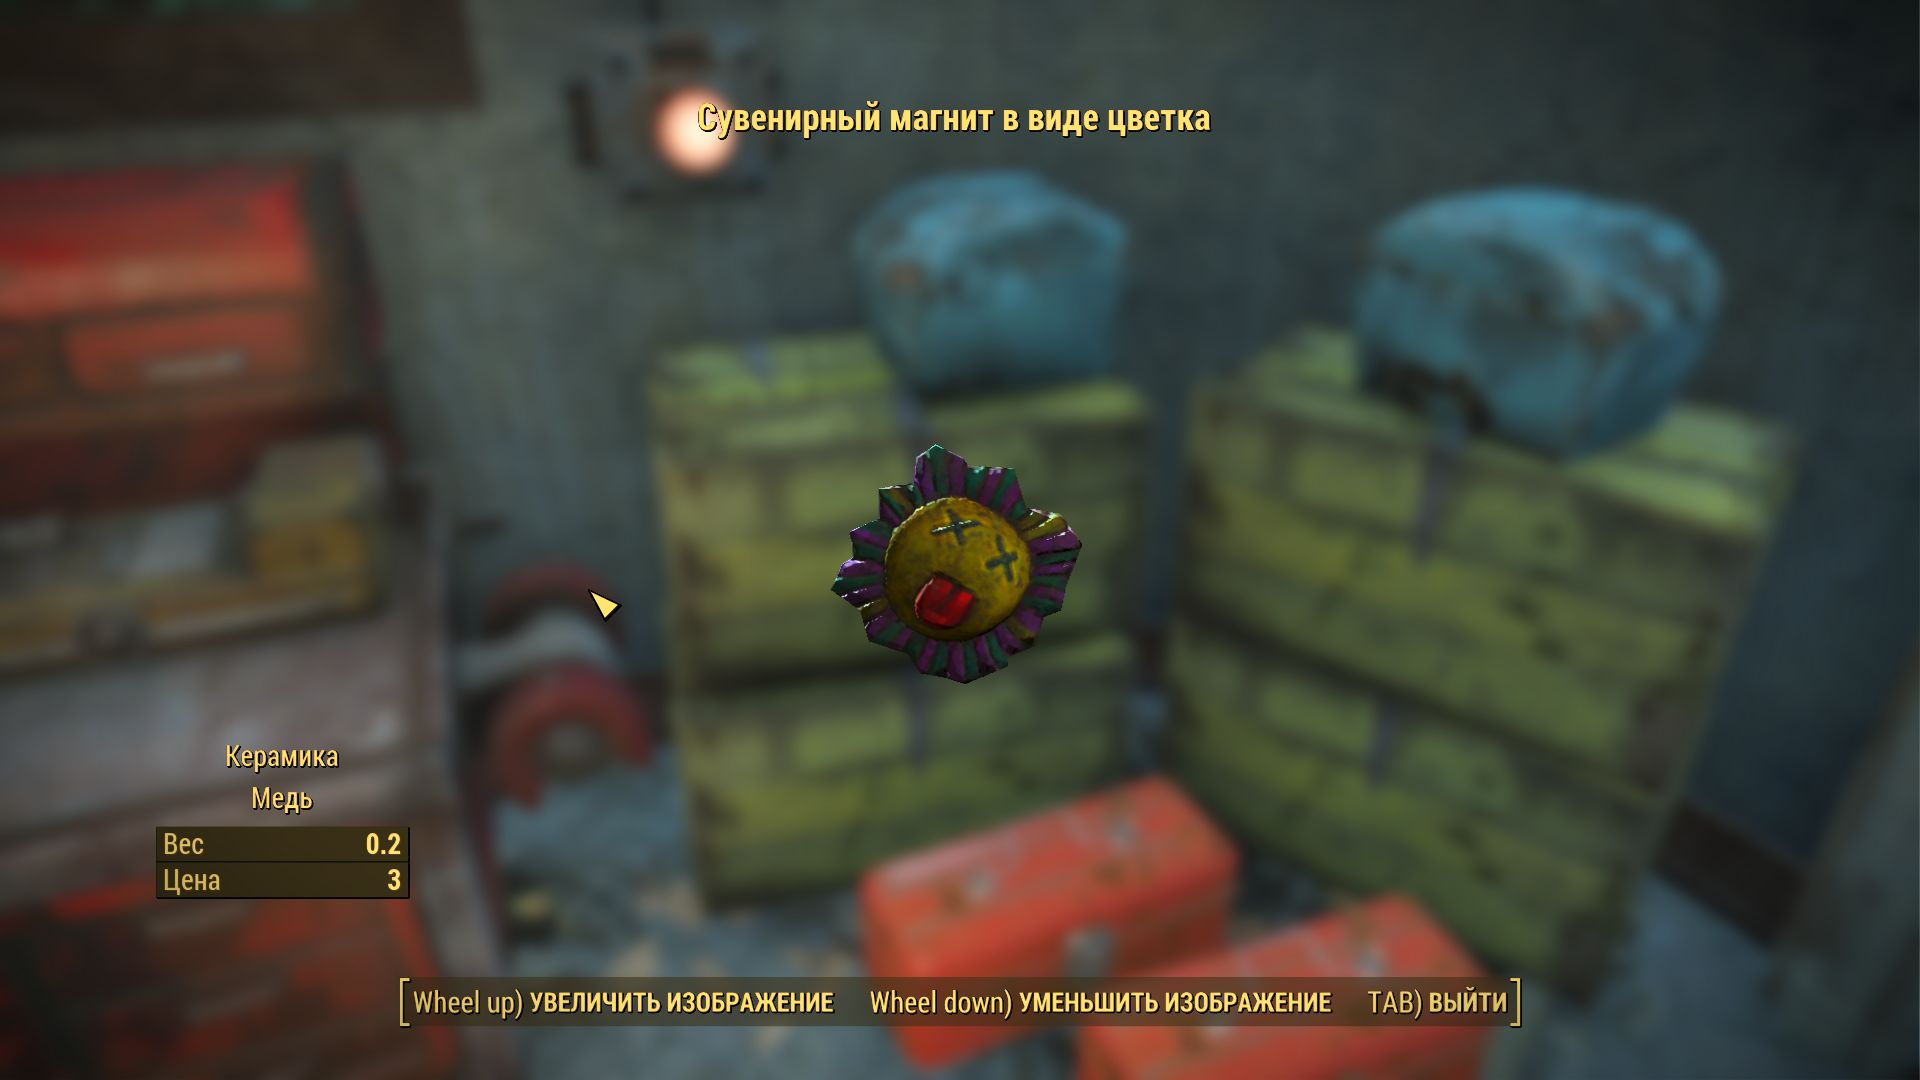 сувенирный магнит-цветок - Fallout 4 магнит, сувенир, цветок, ядер мир